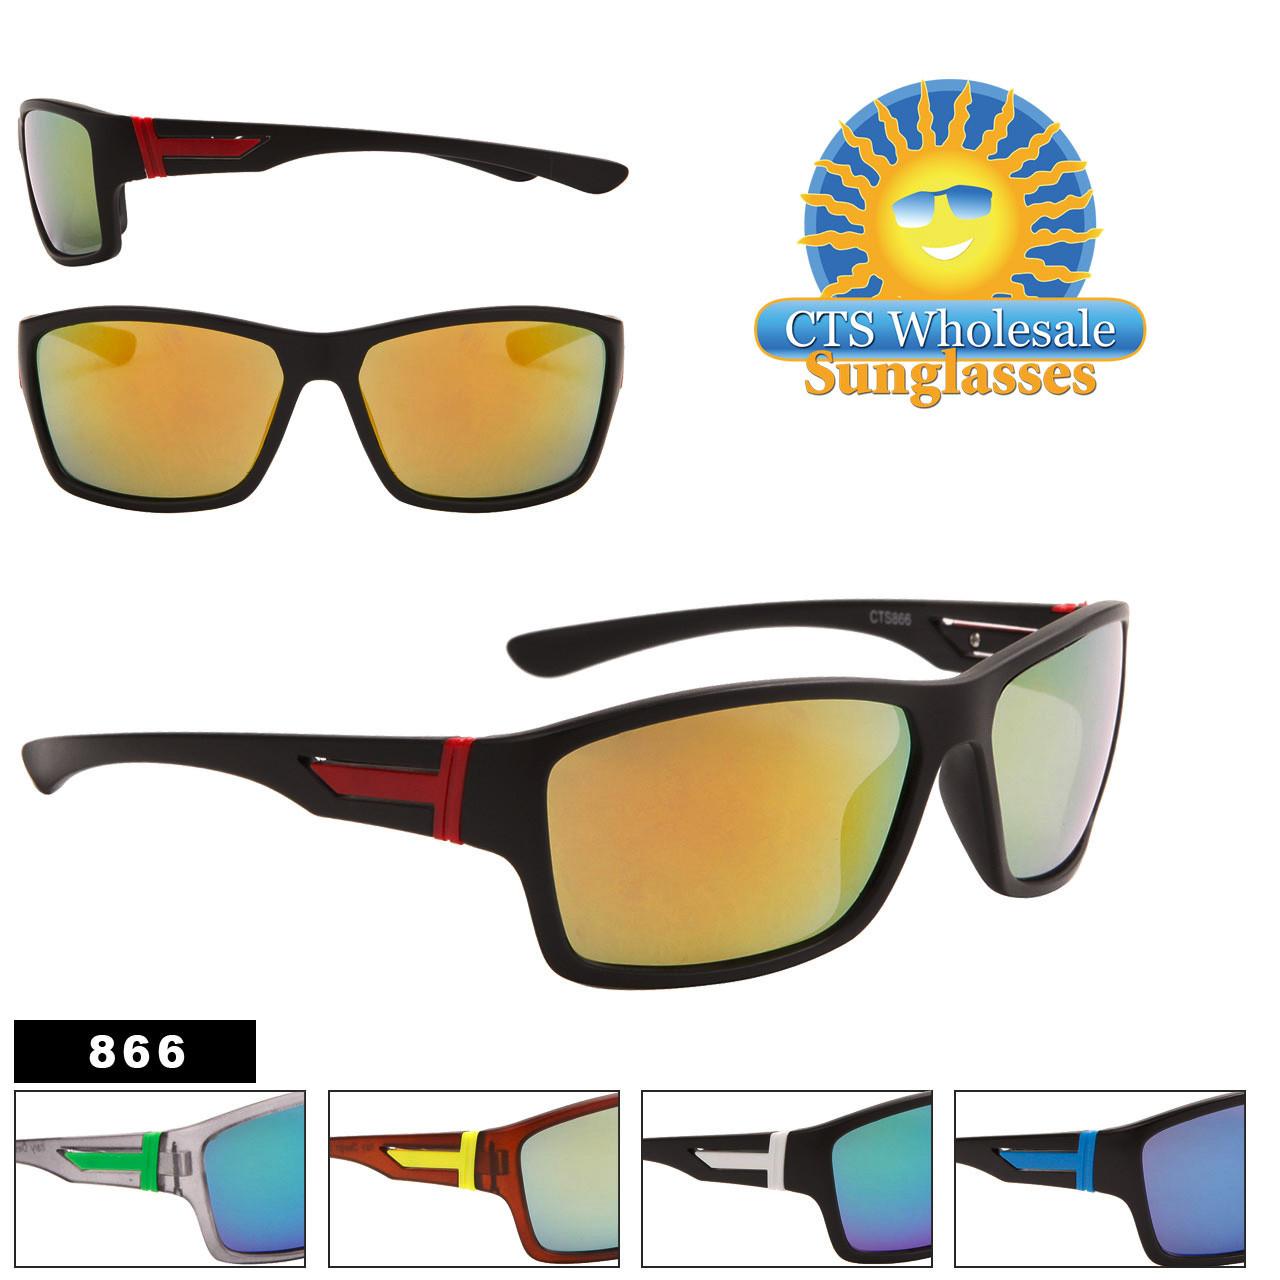 Men's Mirrored Sunglasses by the Dozen - Style #866